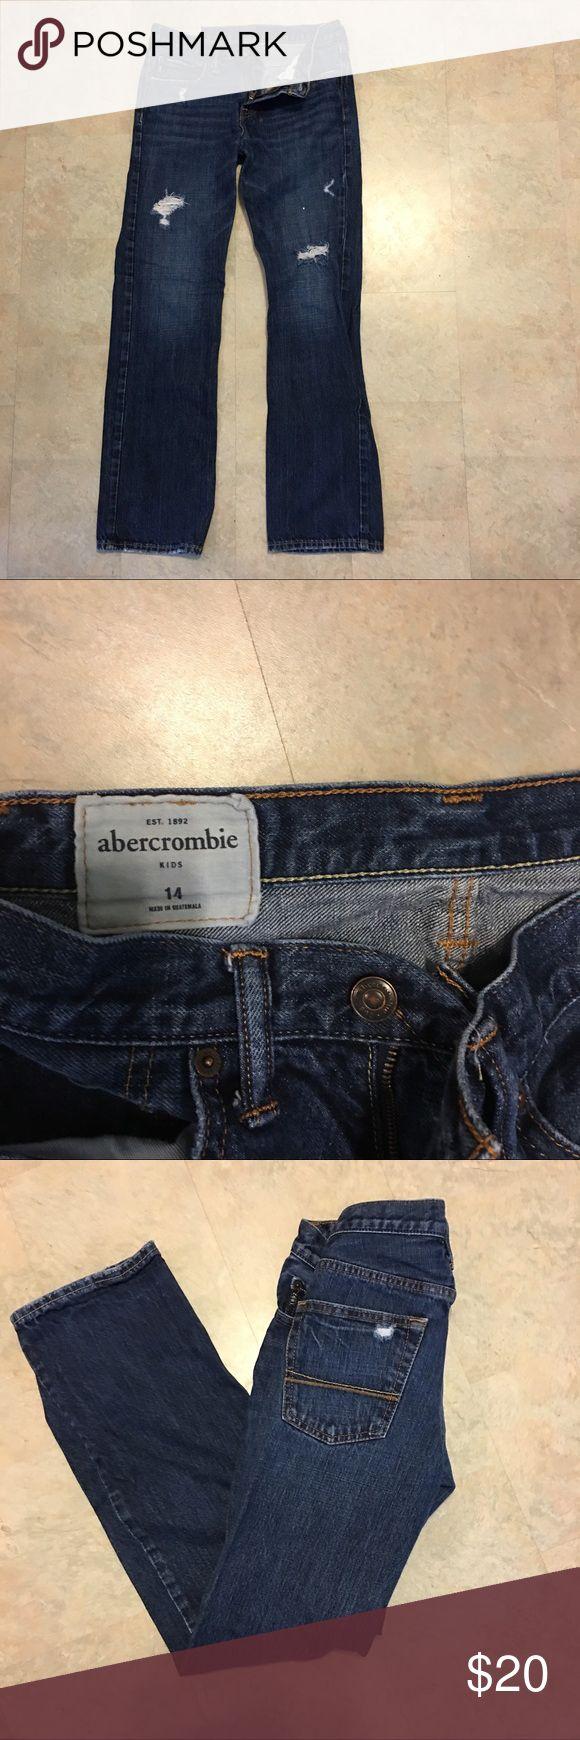 Abercrombie jeans (boys) Abercrombie kids jeans abercrombie kids Bottoms Jeans